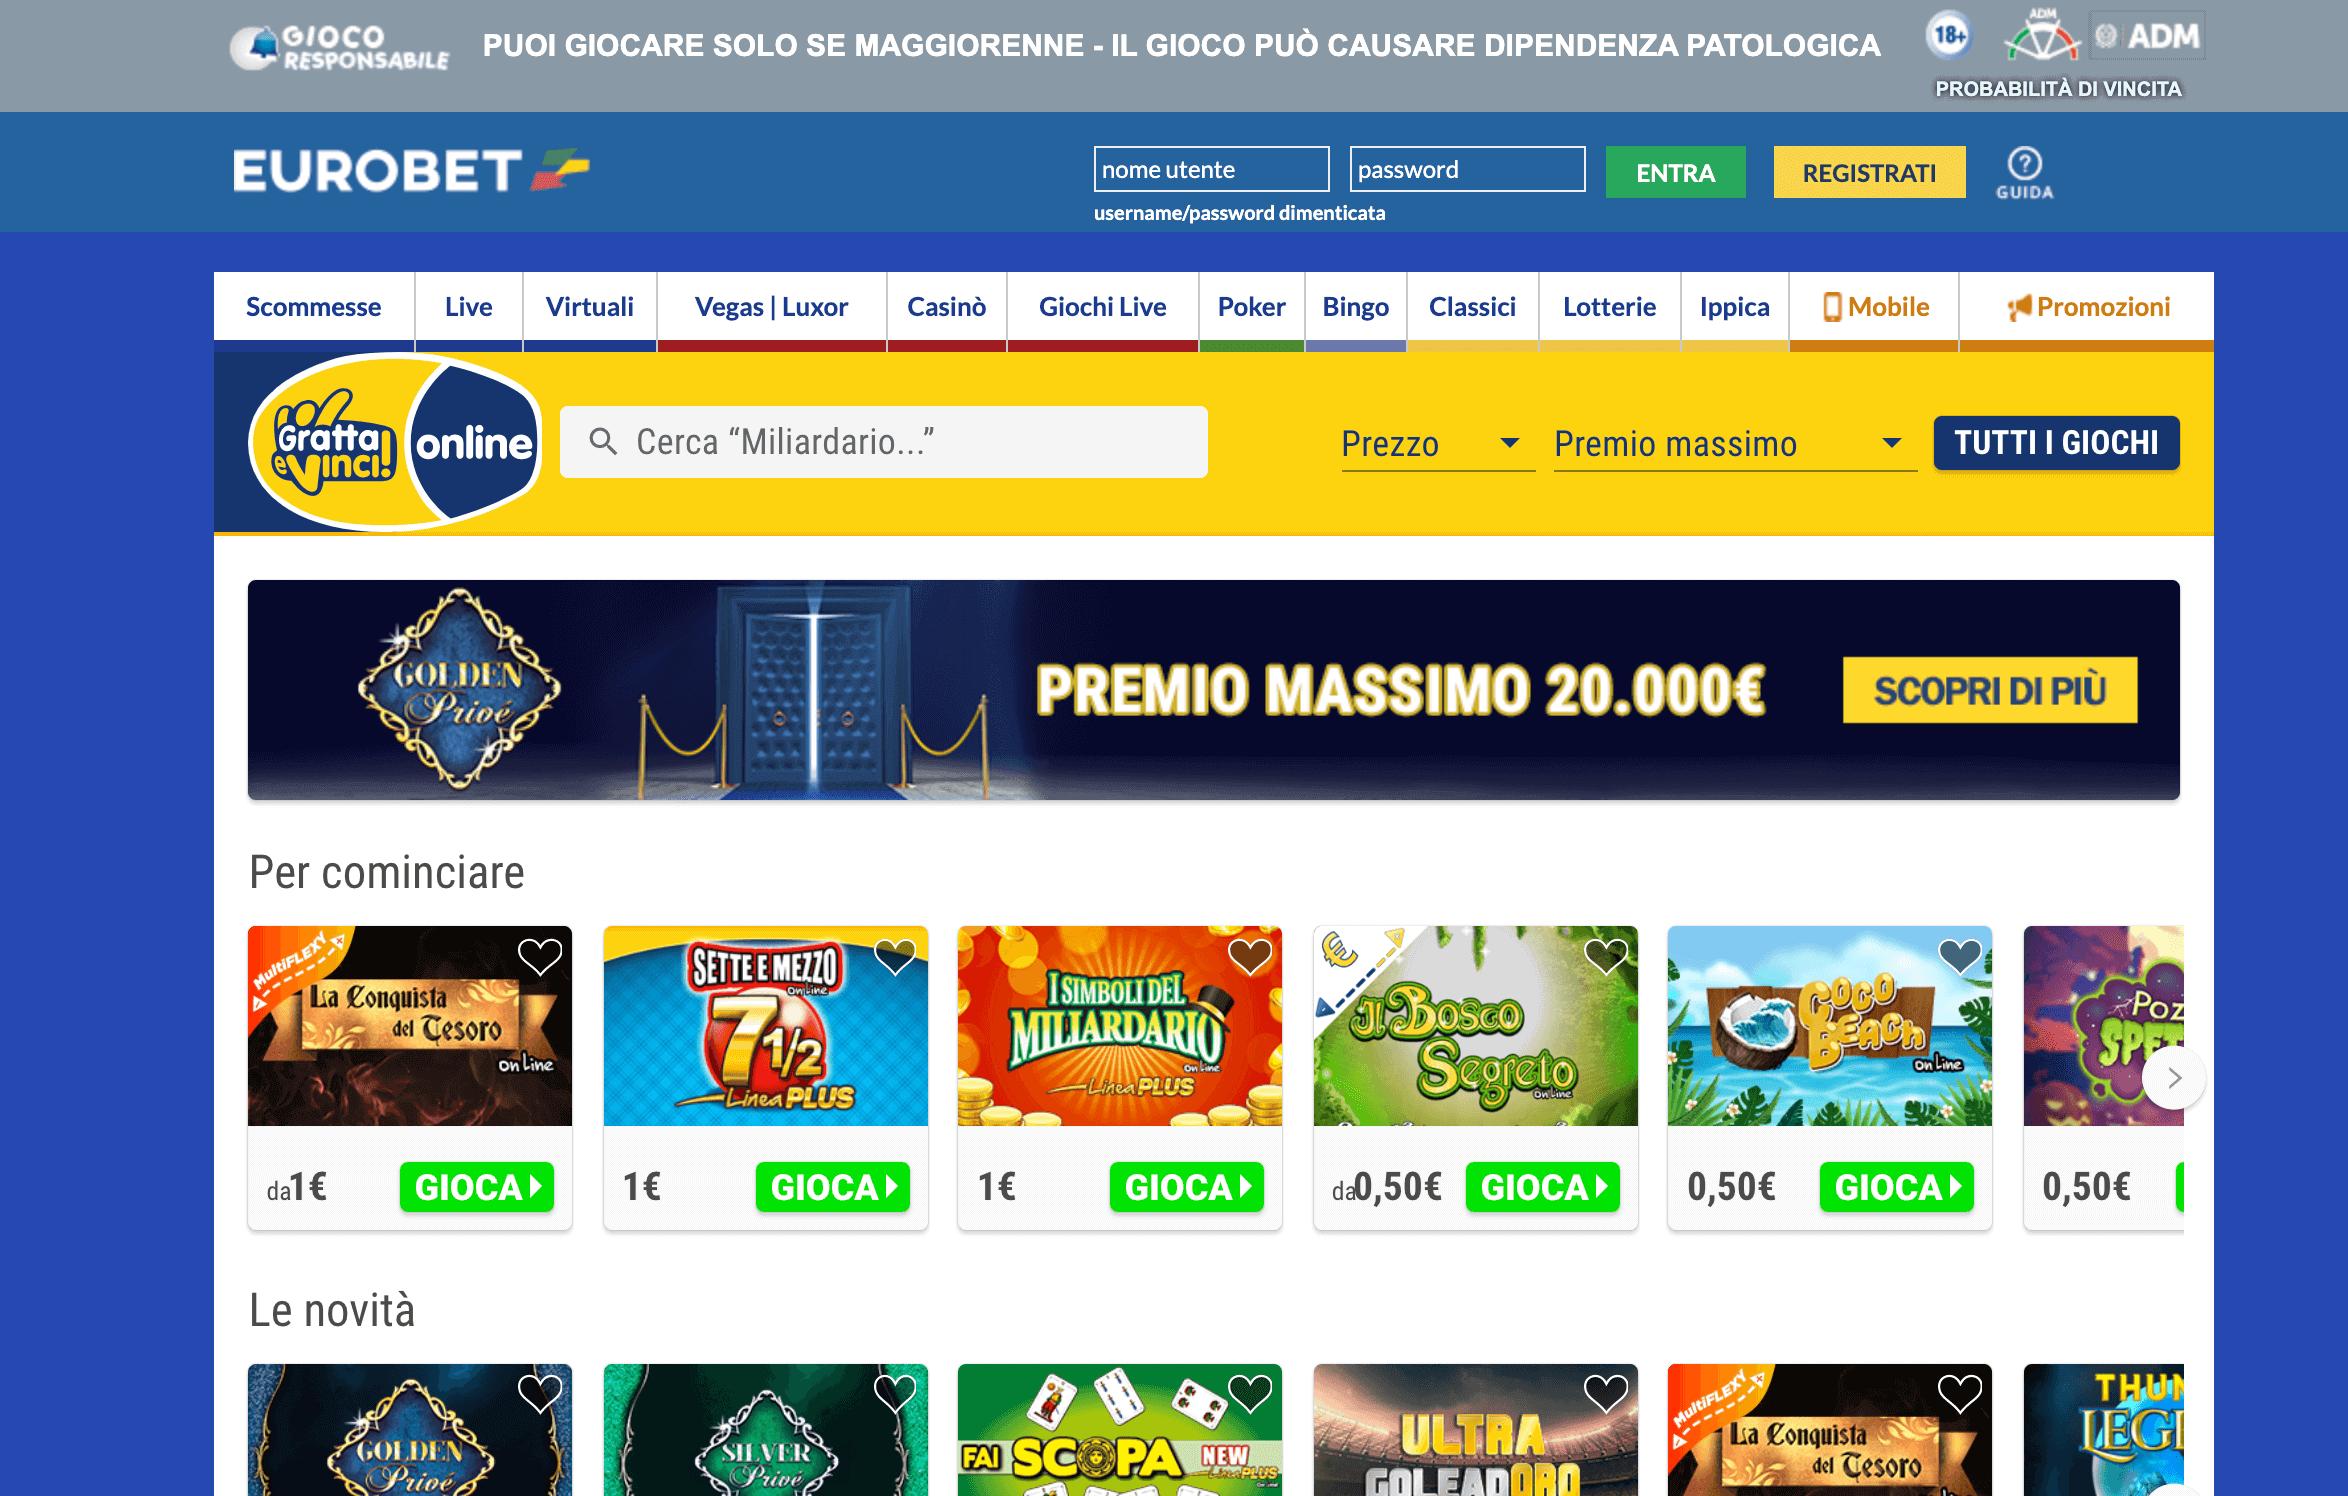 eurobet lotterie